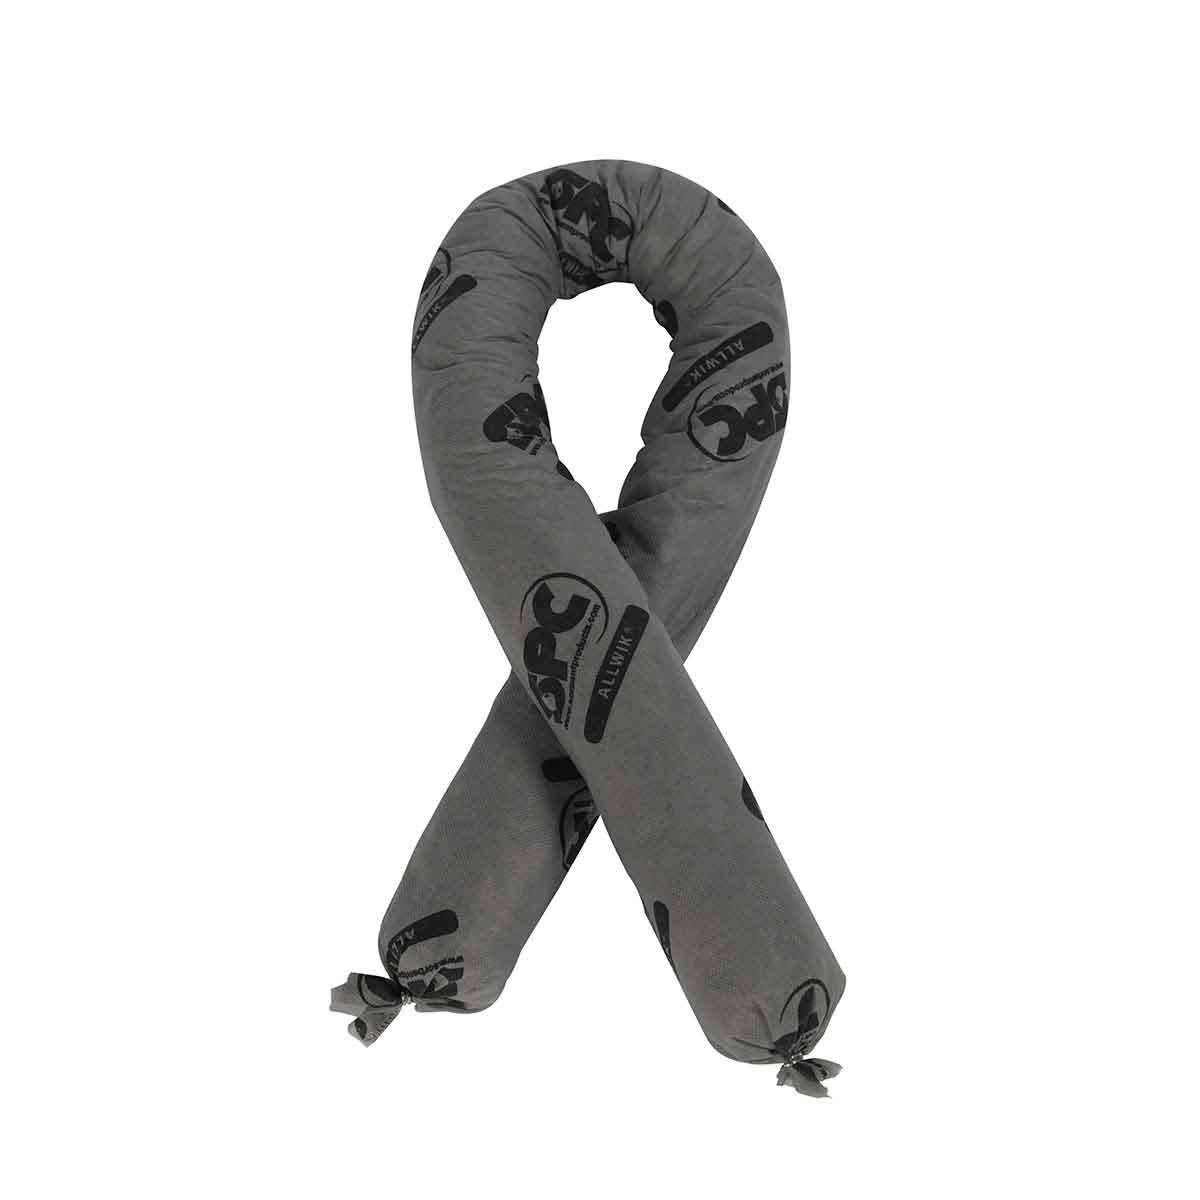 SPC® AllWik® AW412 All Purpose Flexi-Sock Absorbent Sock, 3 in Dia x 4 ft L, 12 gal Absorption, Fluids Absorbed: Universal, Polypropylene, Gray